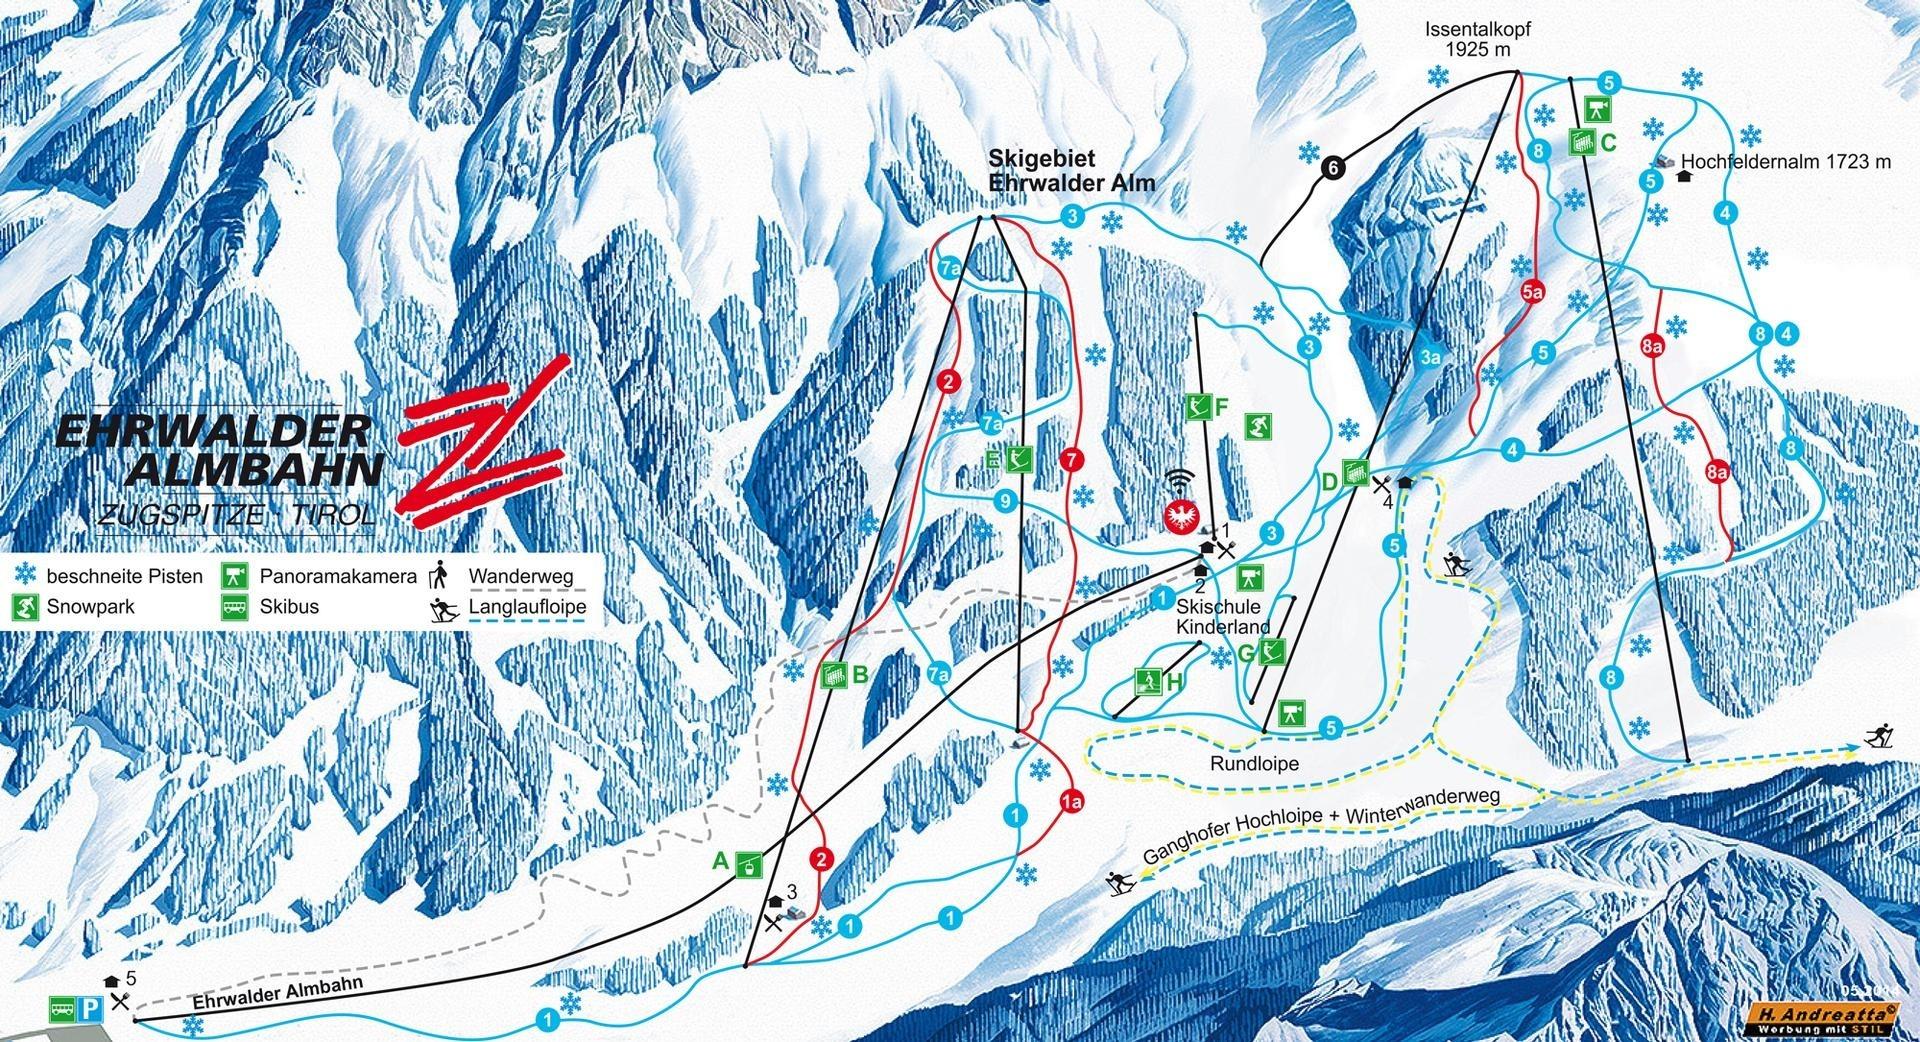 Lyžařská mapa sjezdovek areálu Ehrwald / Wettersteinbahnen